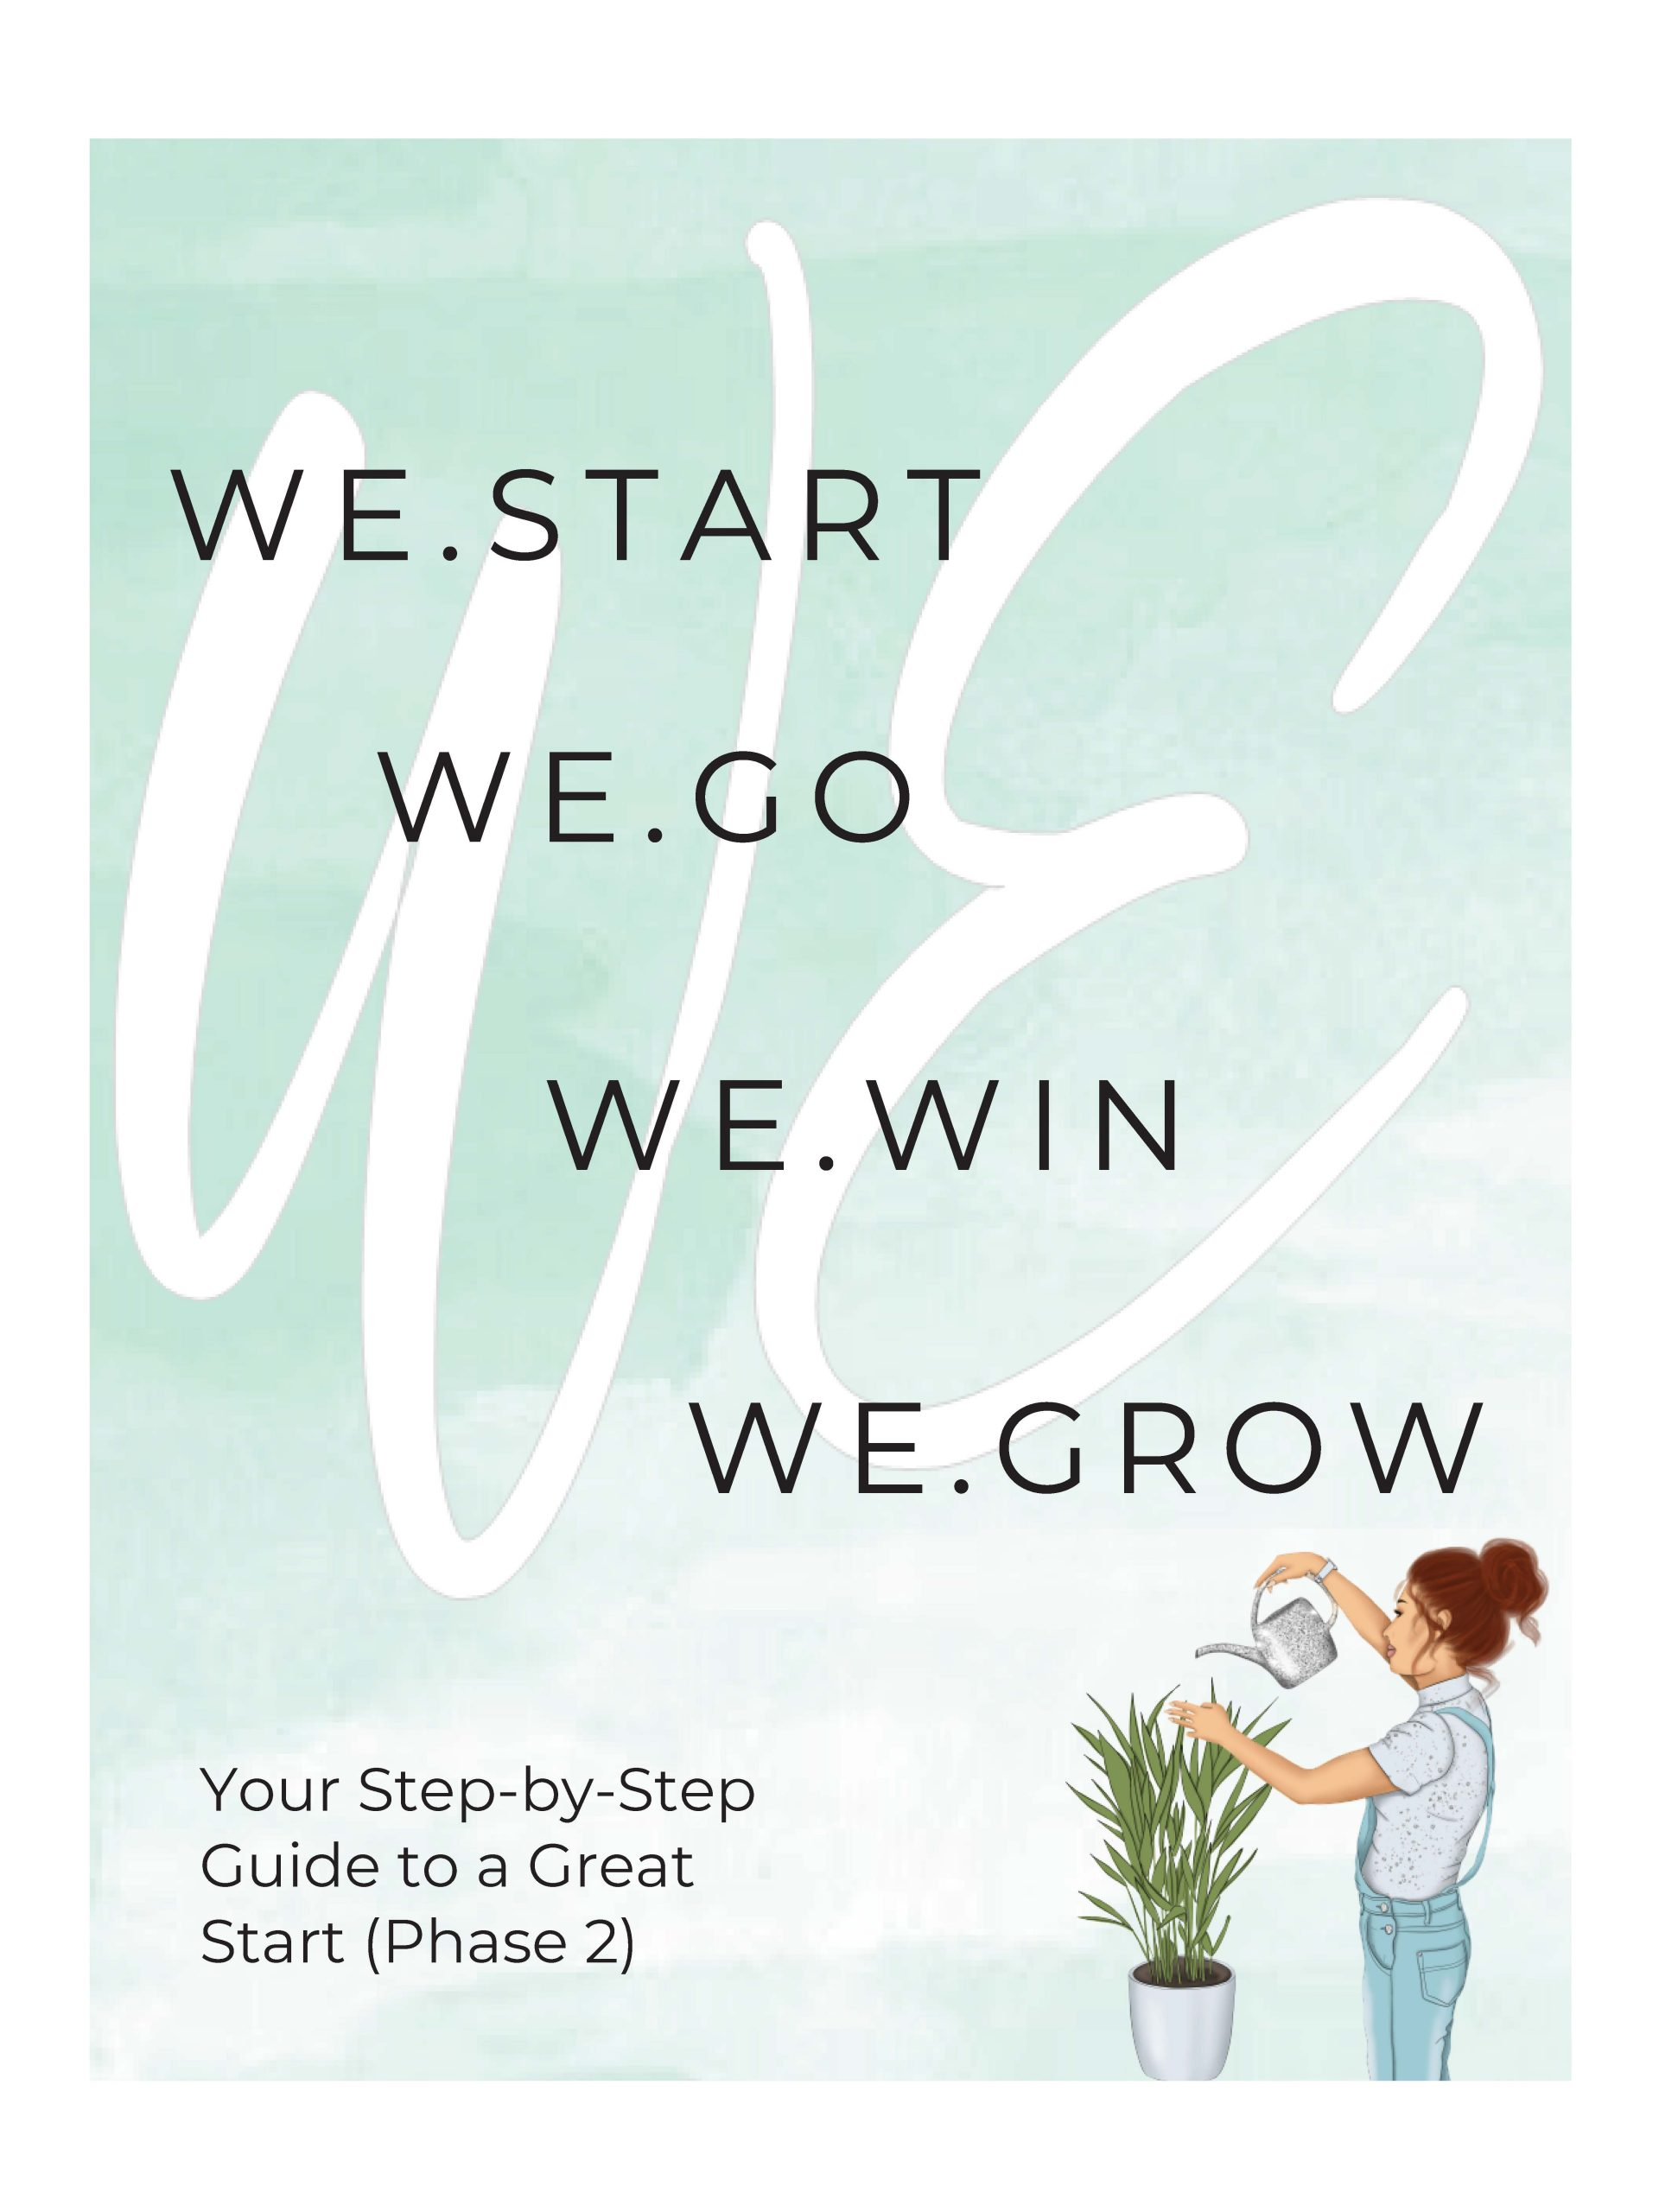 WE.Grow